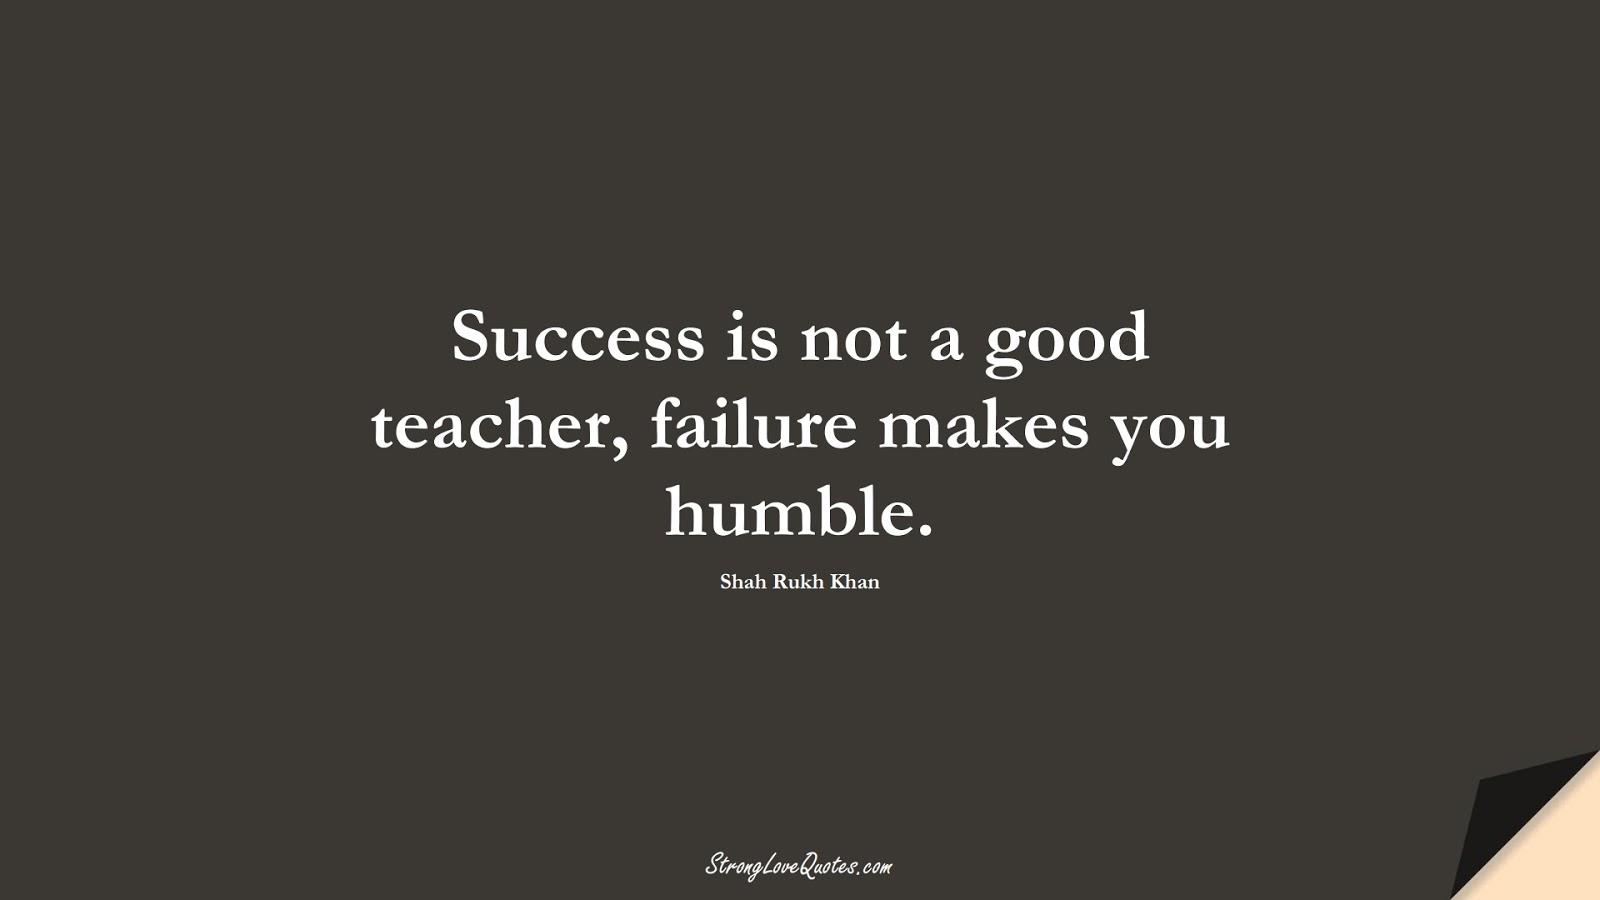 Success is not a good teacher, failure makes you humble. (Shah Rukh Khan);  #EducationQuotes